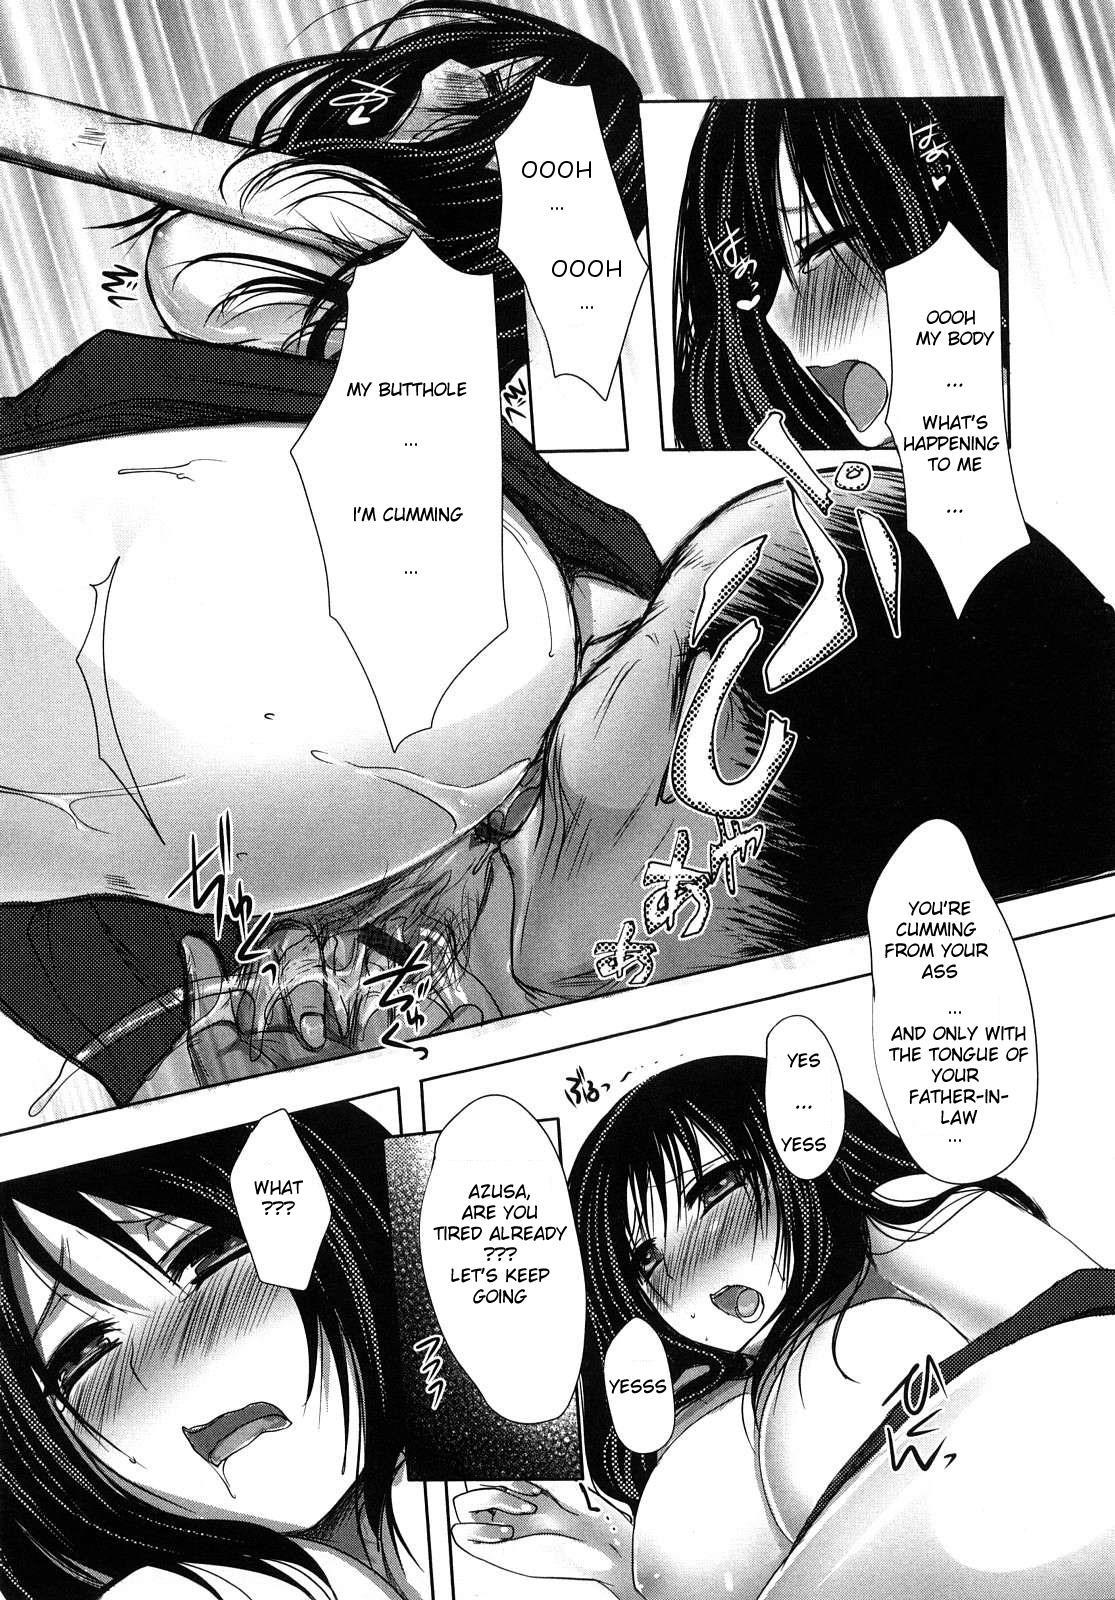 Otou-sama no Mesu   The Bitch of My Father in Law 10